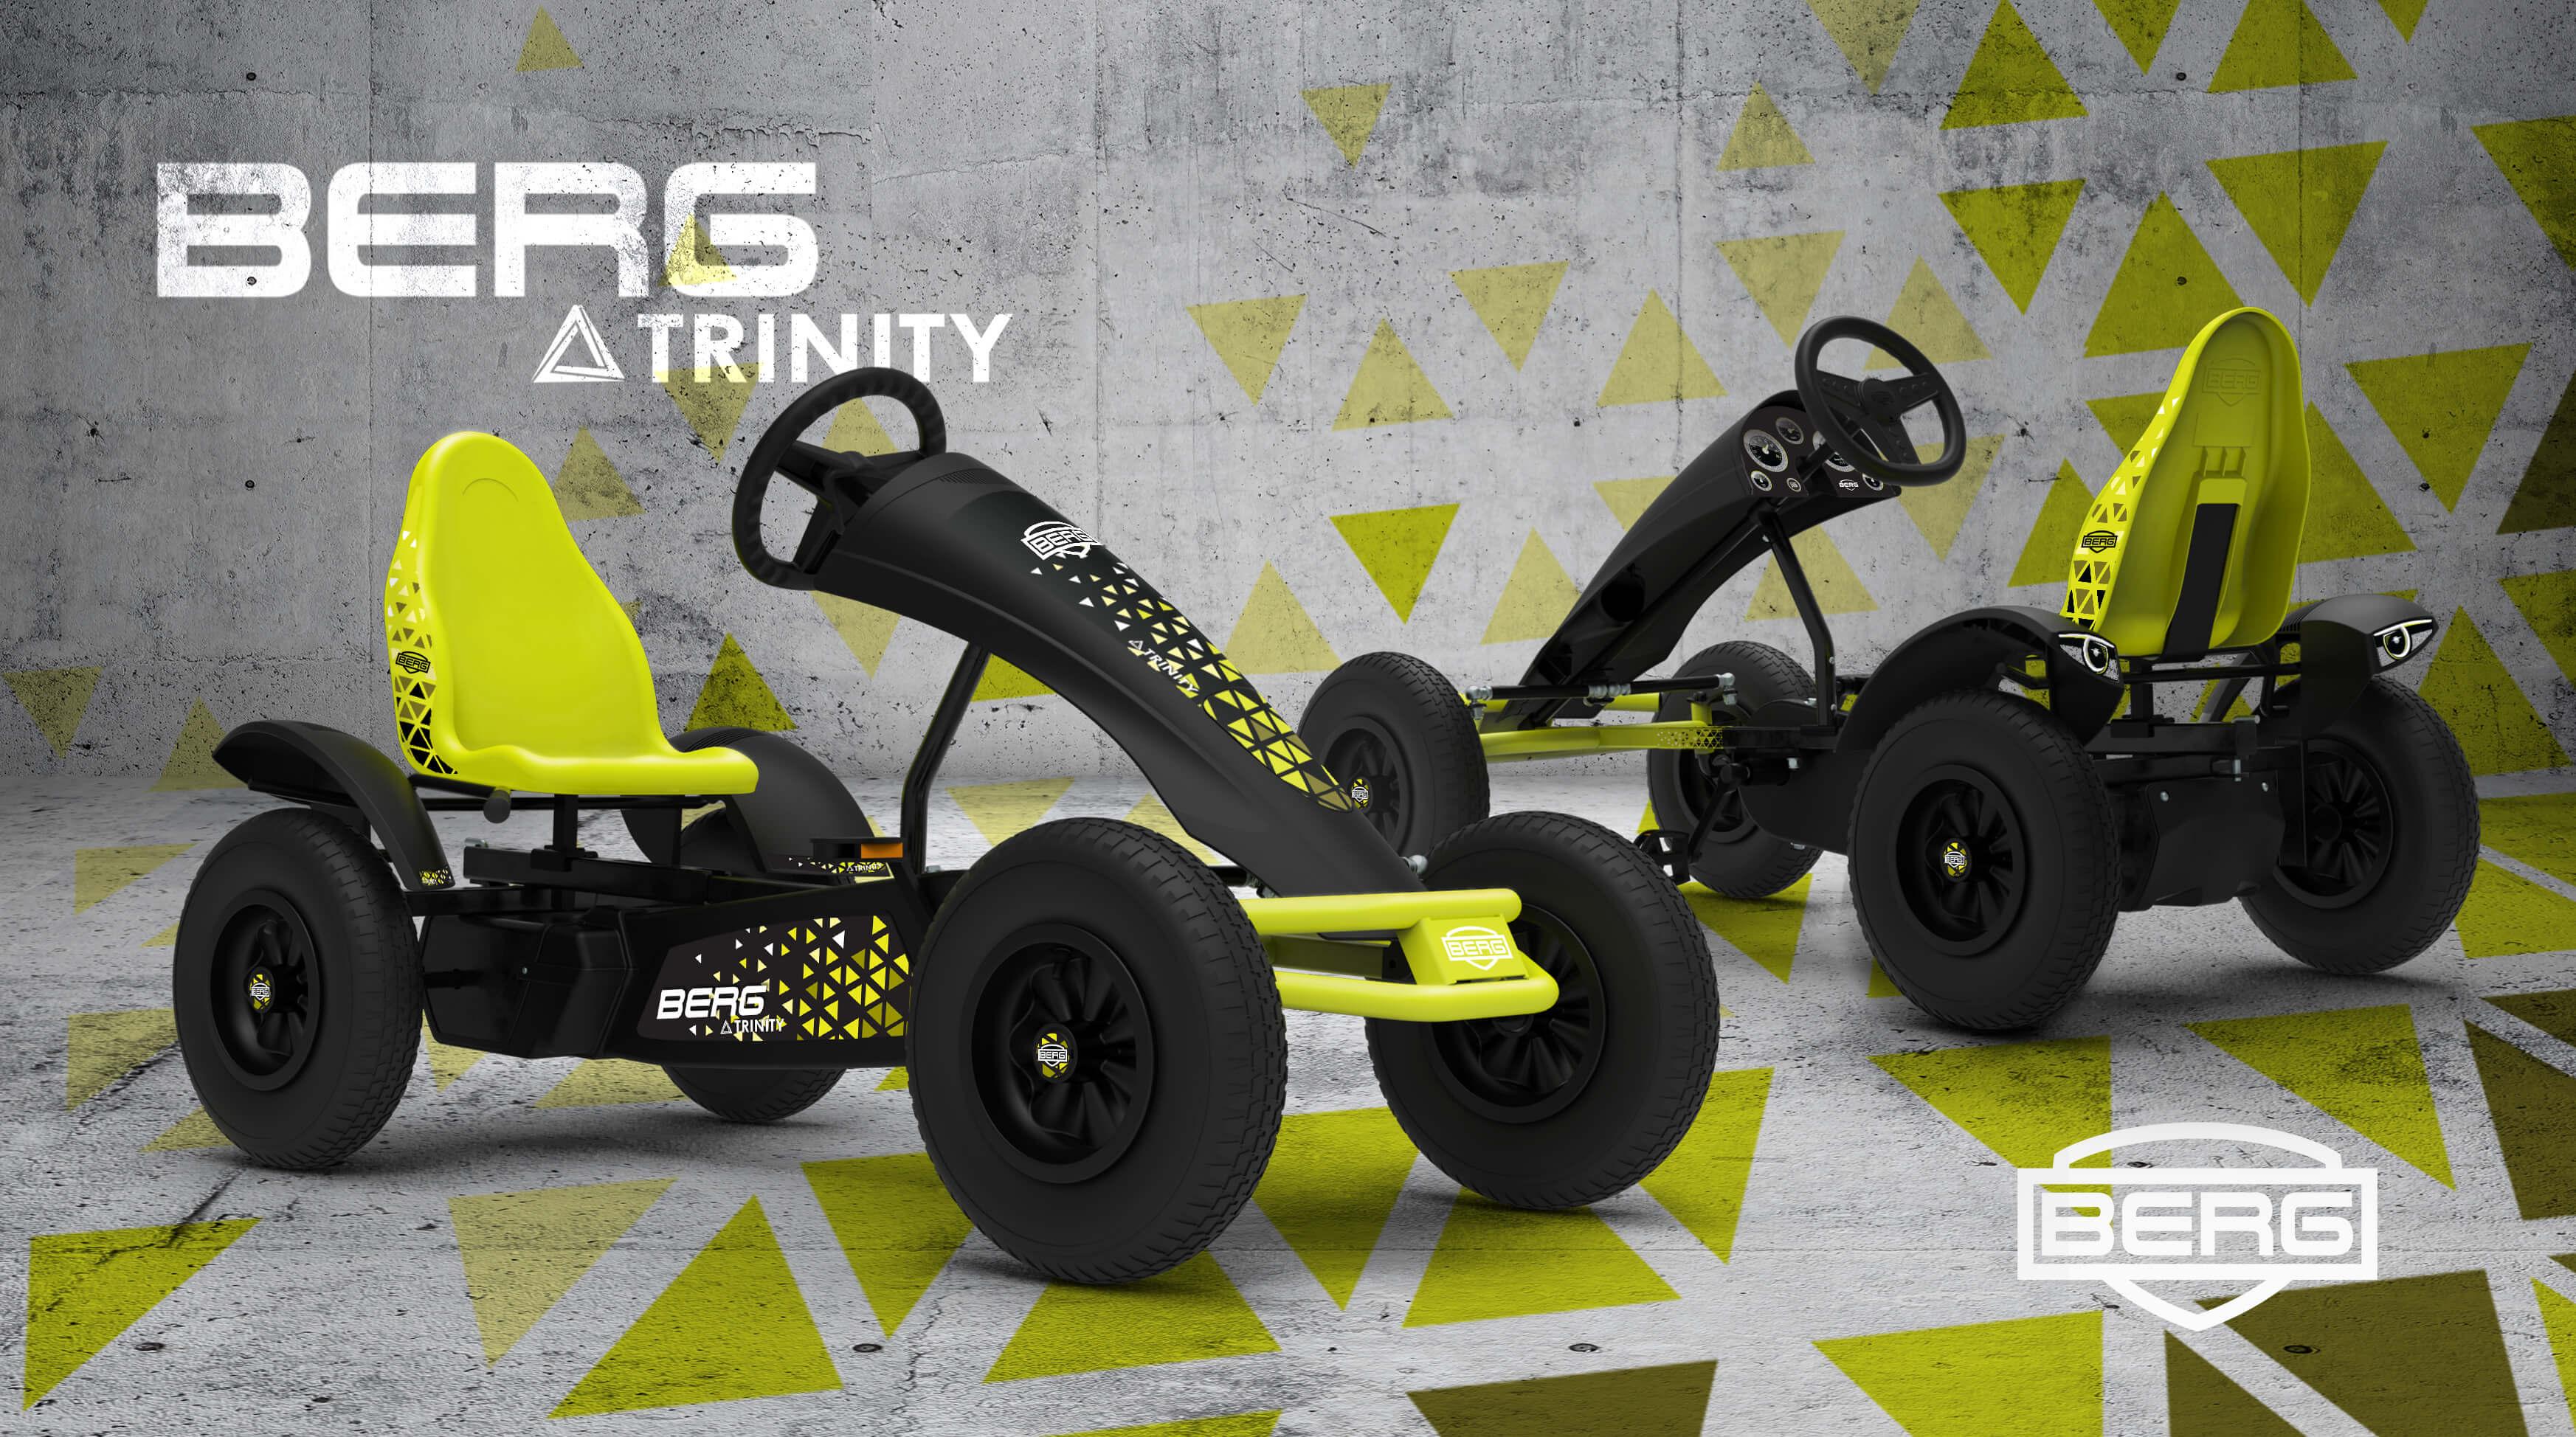 BERG Gokart Sondermodell: Berg Trinity BFR/BFR-3 - kaufen auf gokart-profi.de